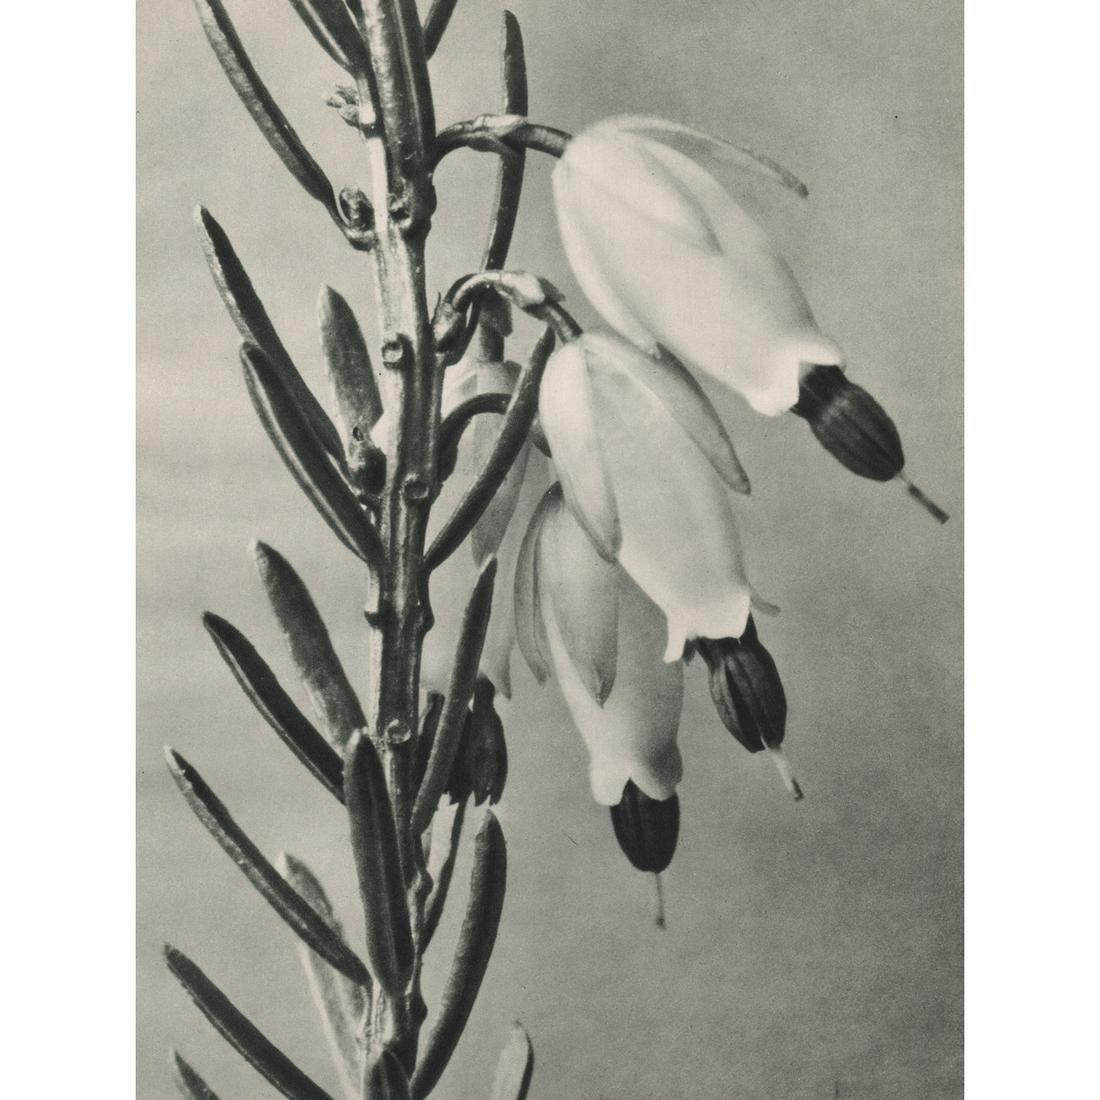 KARL BLOSSFELDT - Erica herbacea